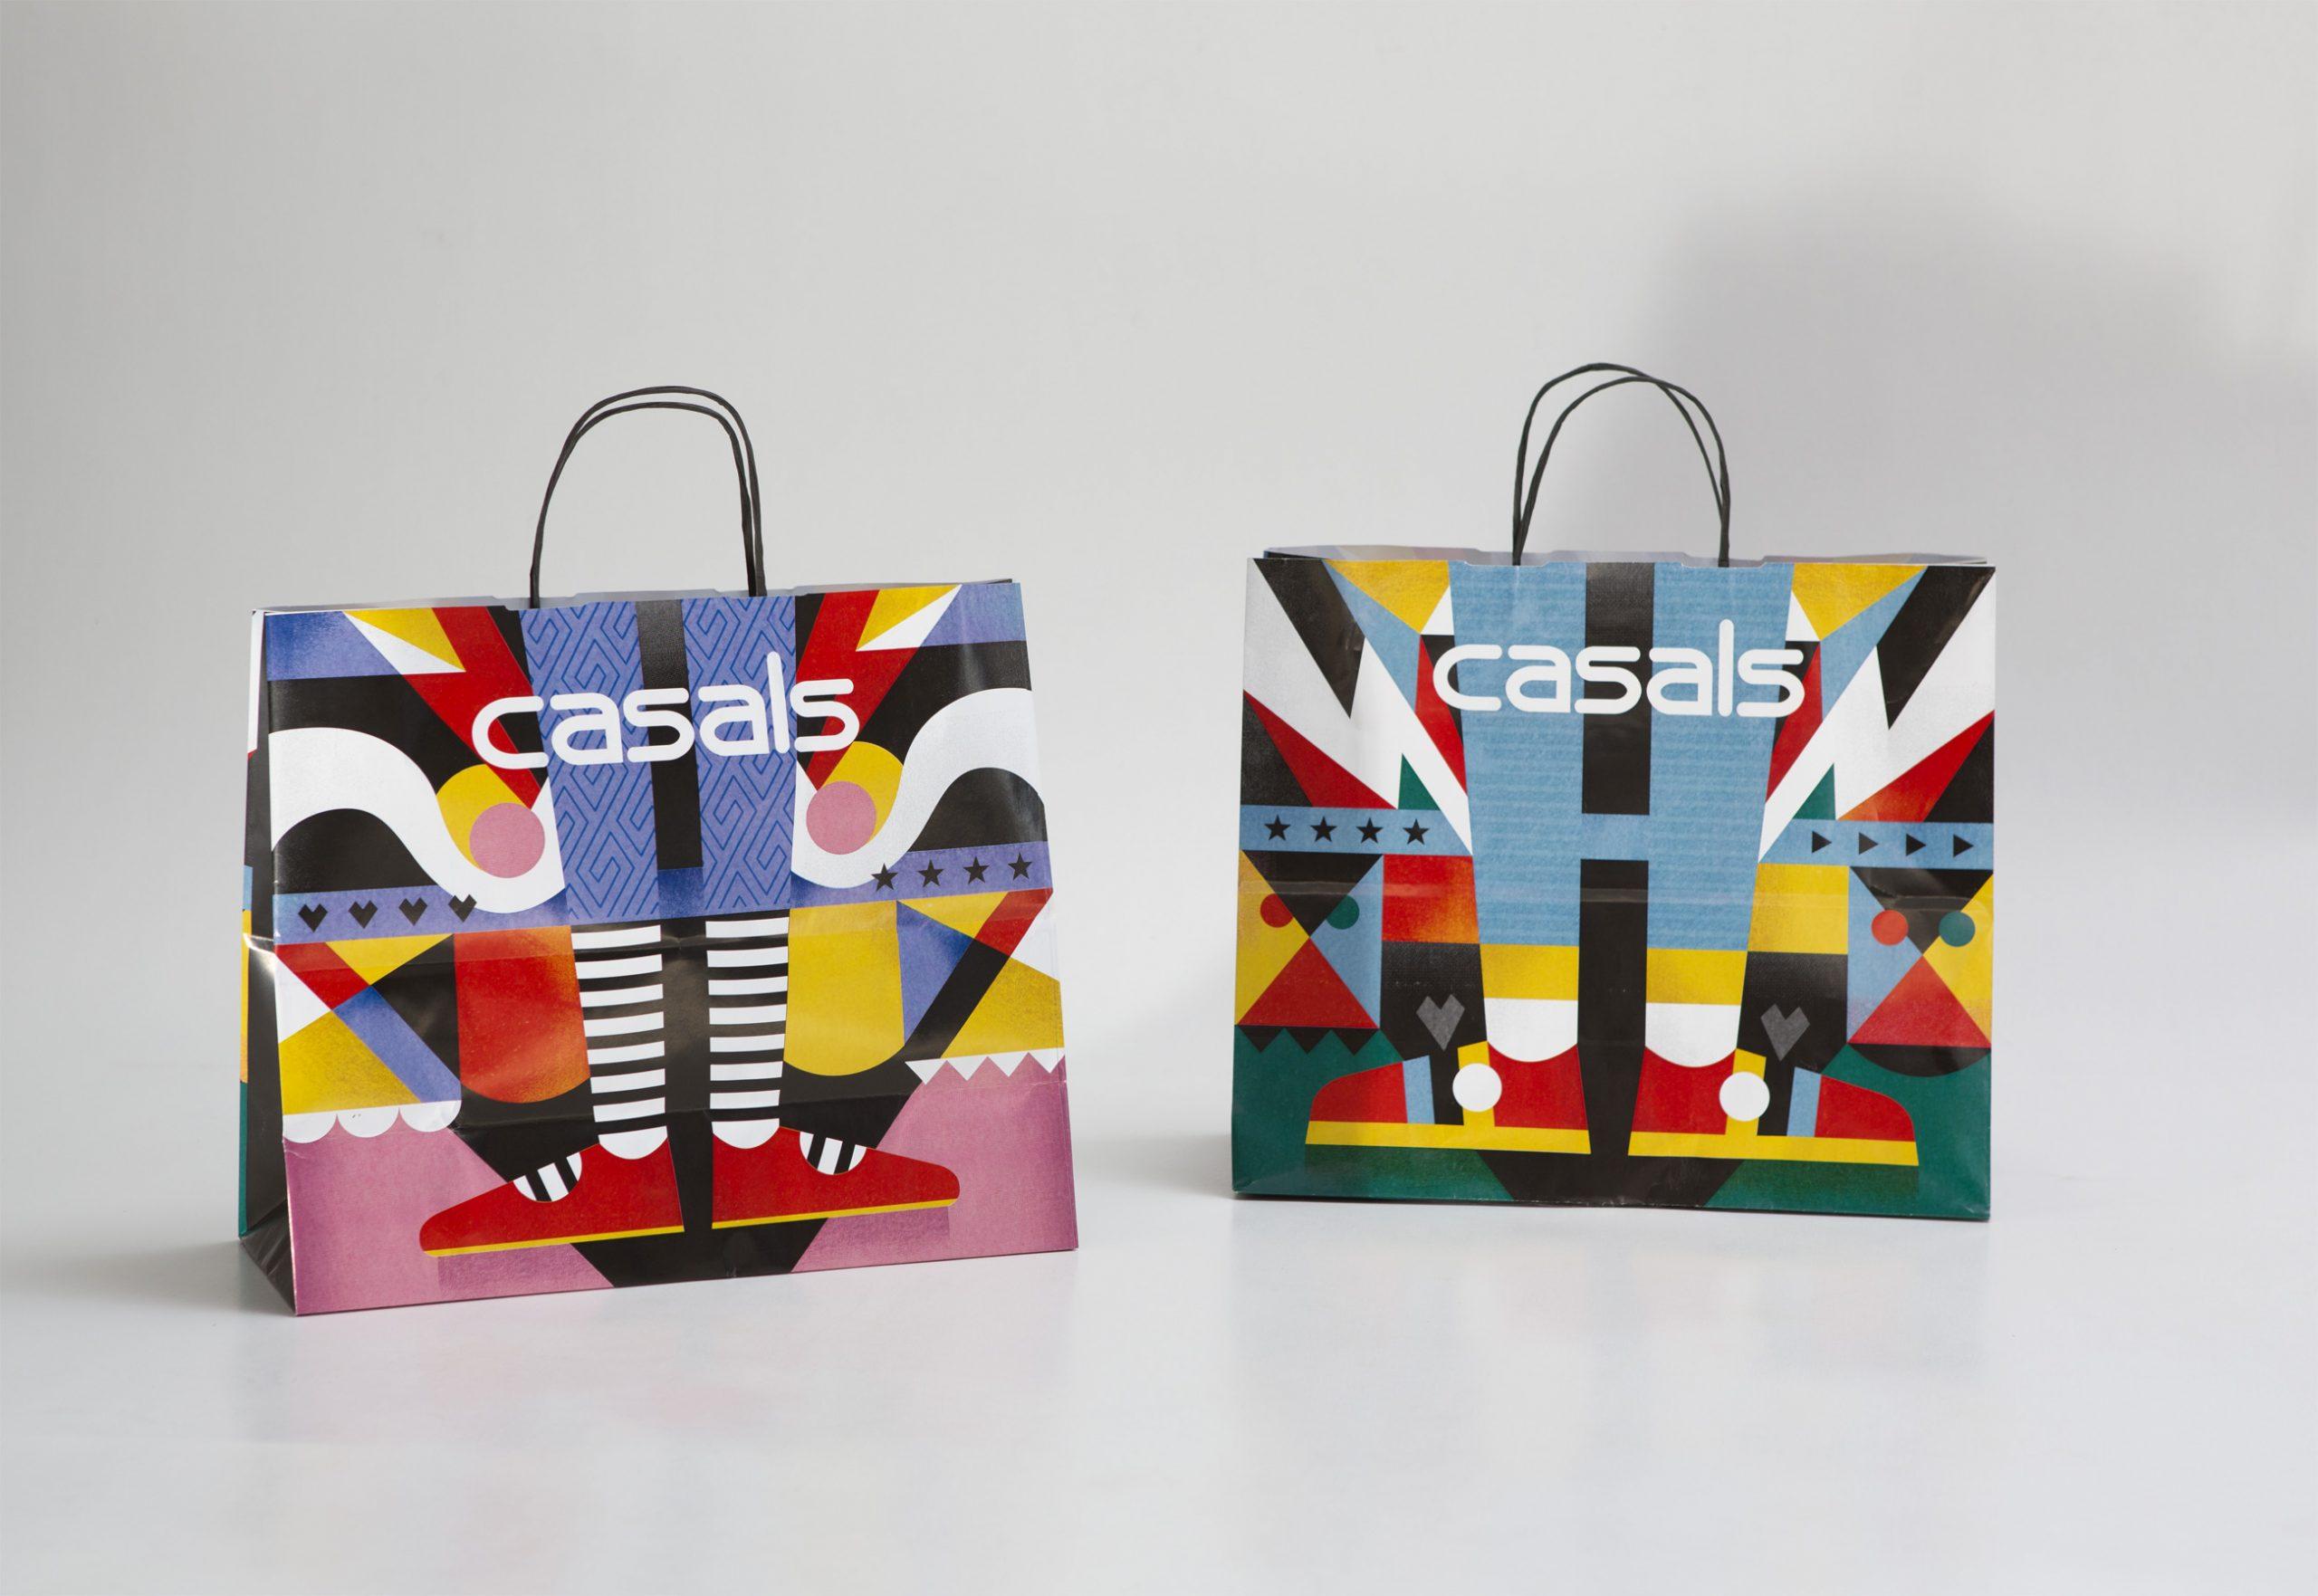 Casals sabaters/ Packaging